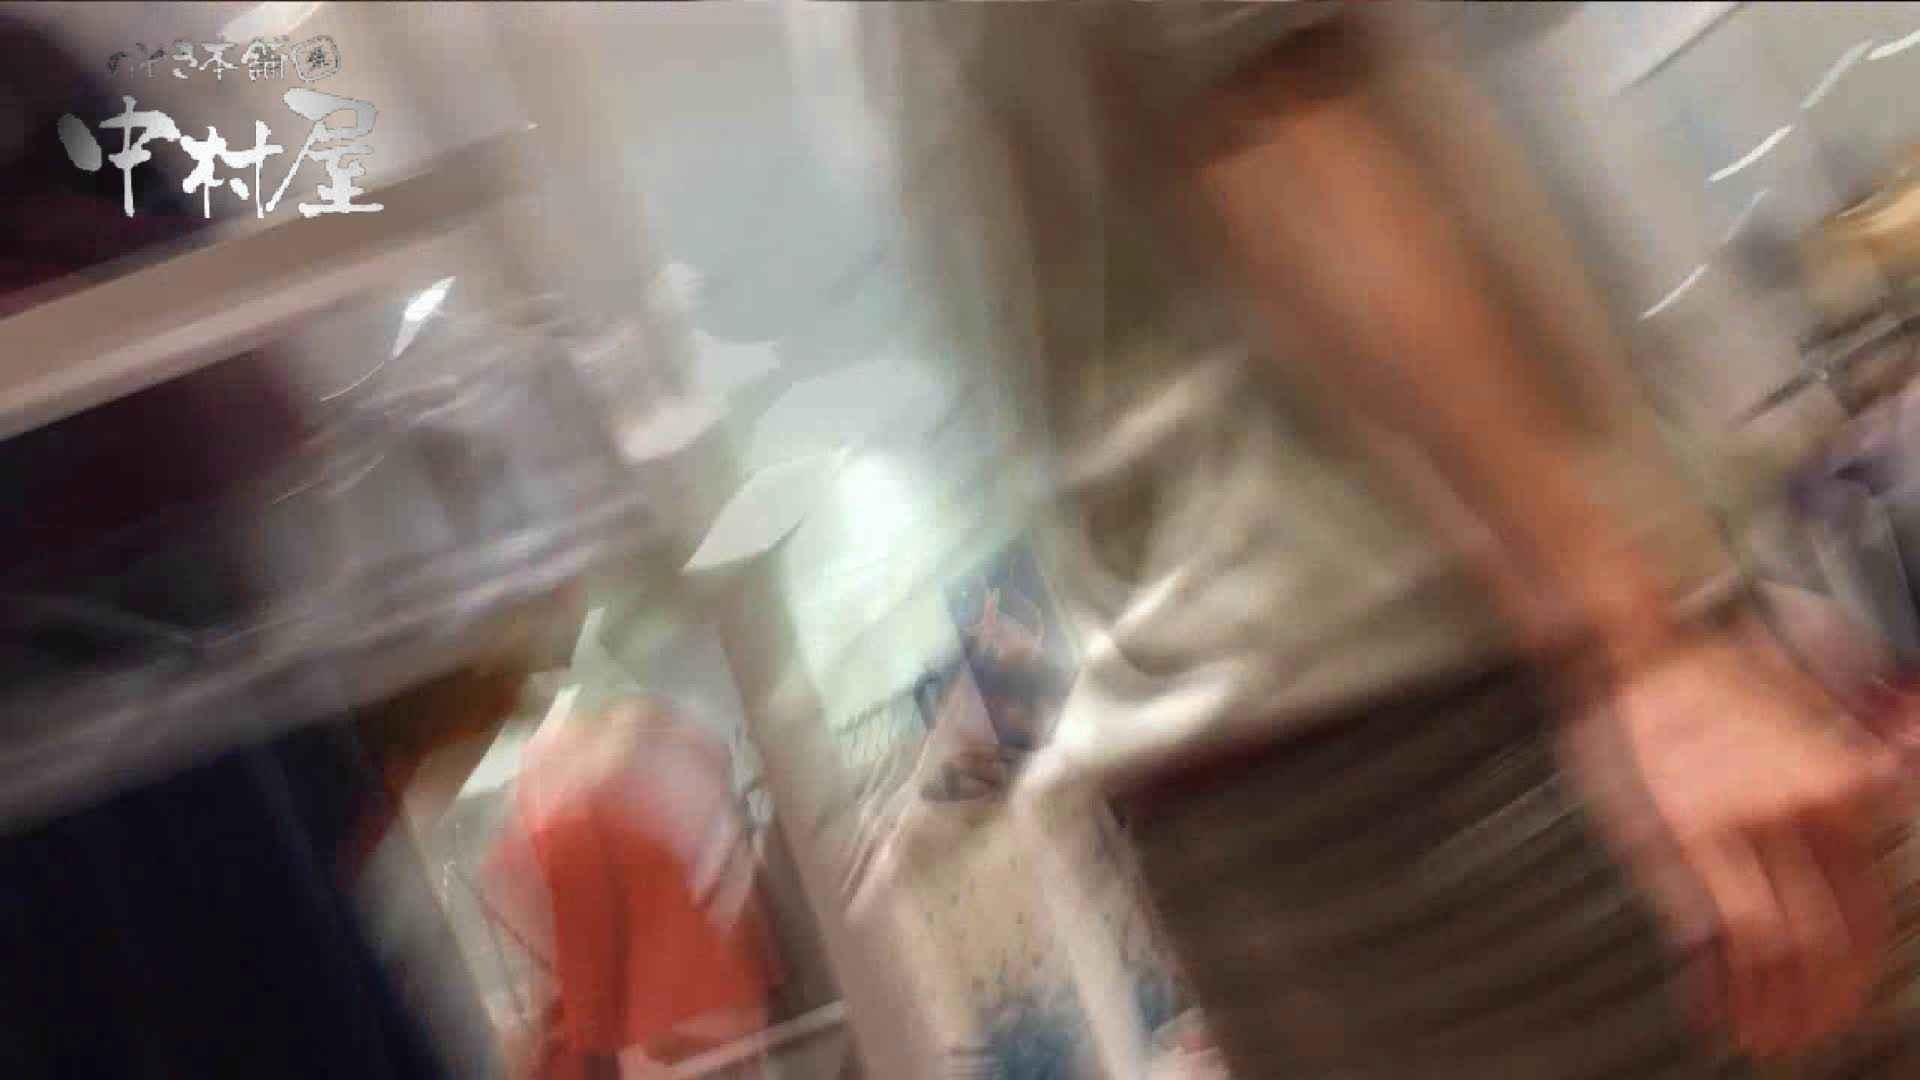 vol.52 美人アパレル胸チラ&パンチラ おとなしそうな店員の胸元にアタック! 美人  94Pix 88